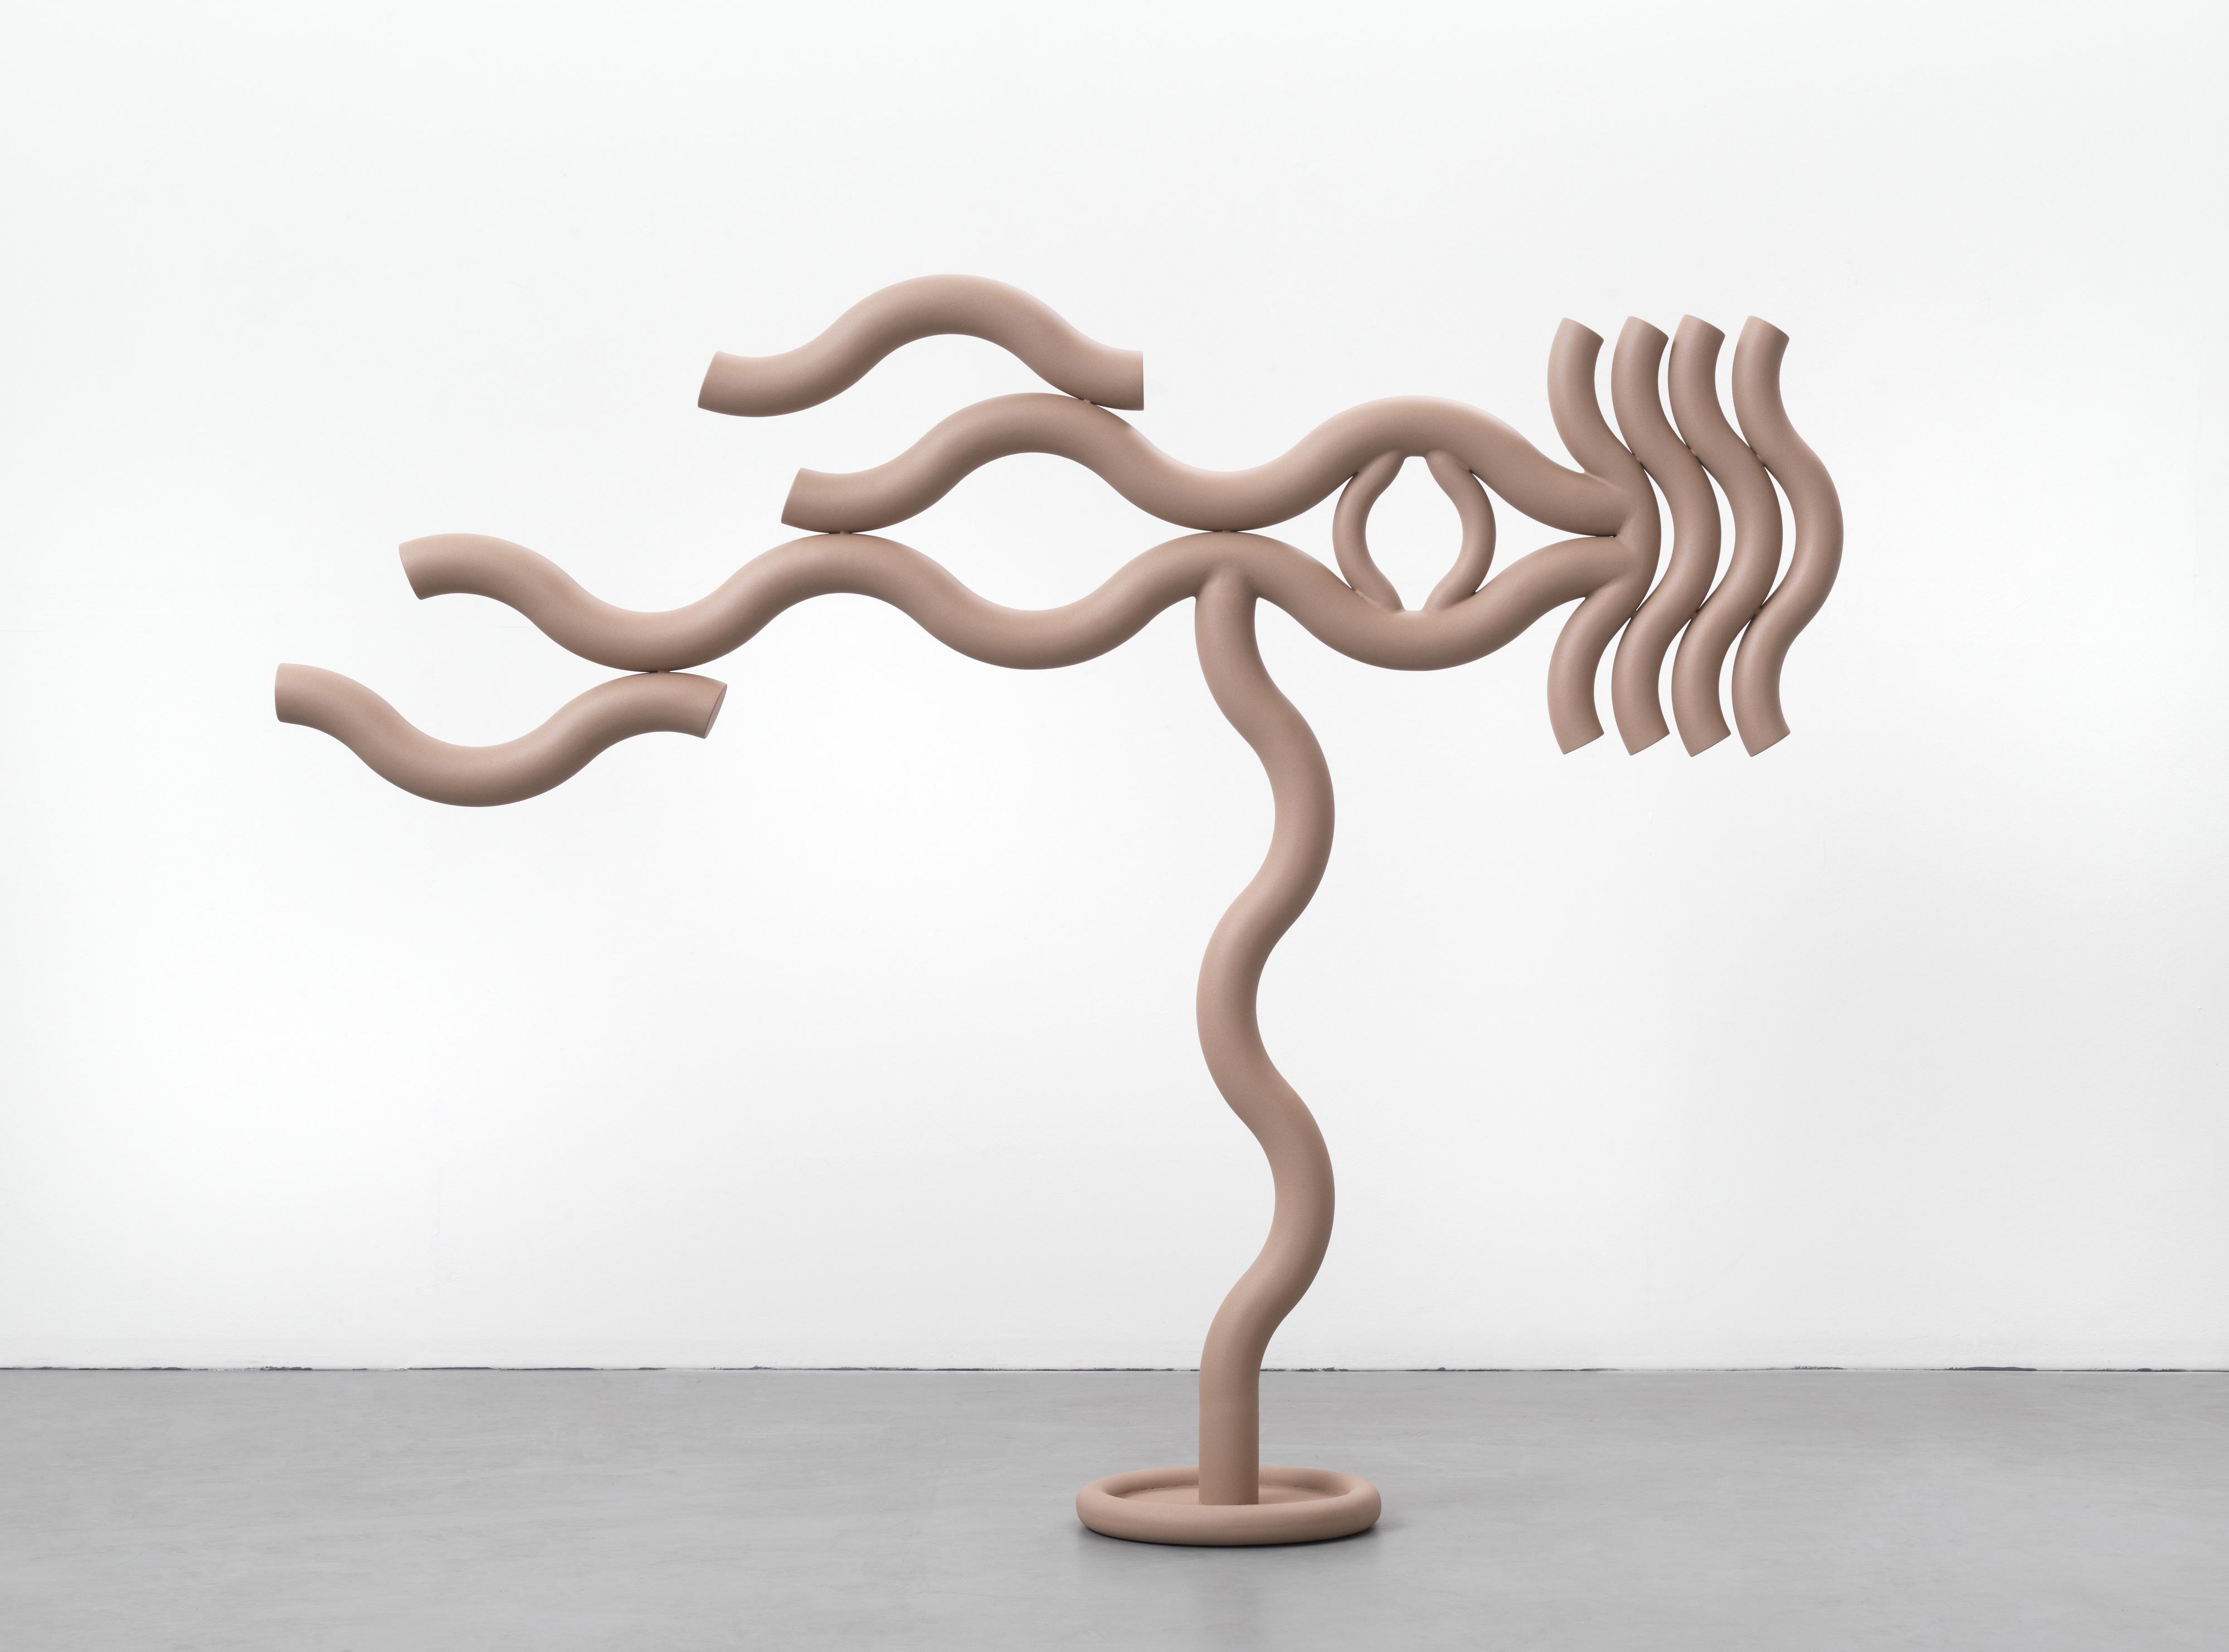 Galerie Barbara Thumm \ Diango Hernández \ OPENED EYE (2020)